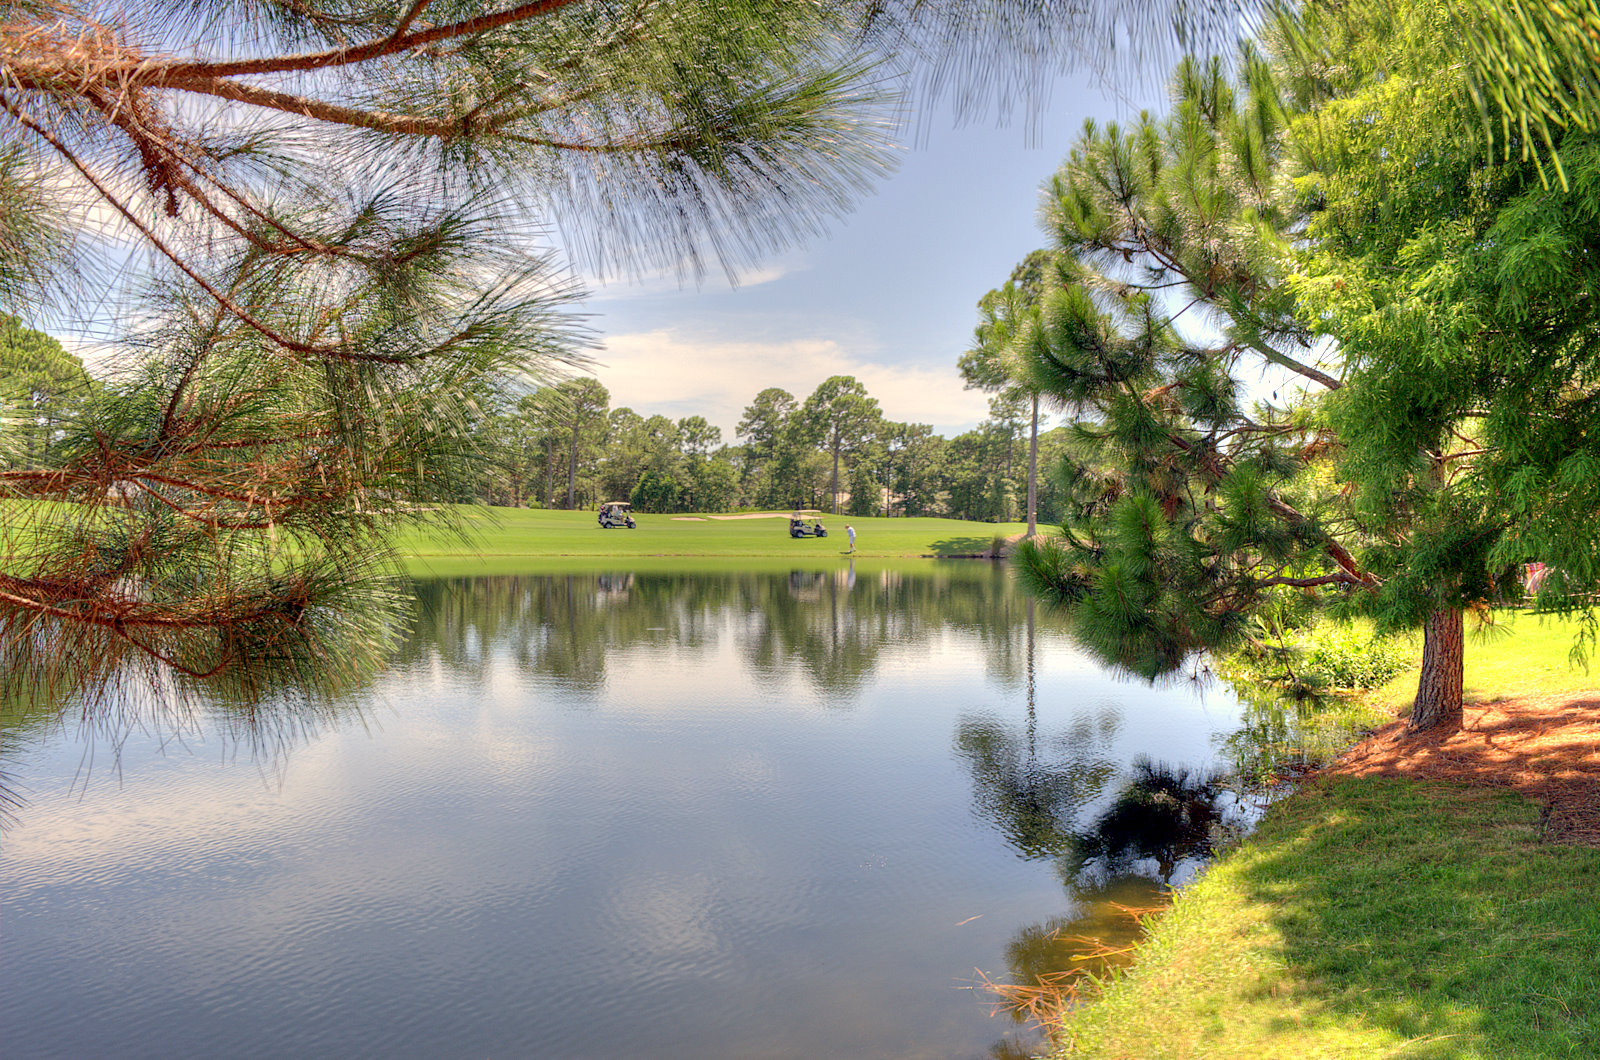 1280 Laurel Grove Condo rental in Sandestin Rentals ~ Cottages and Villas  in Destin Florida - #23